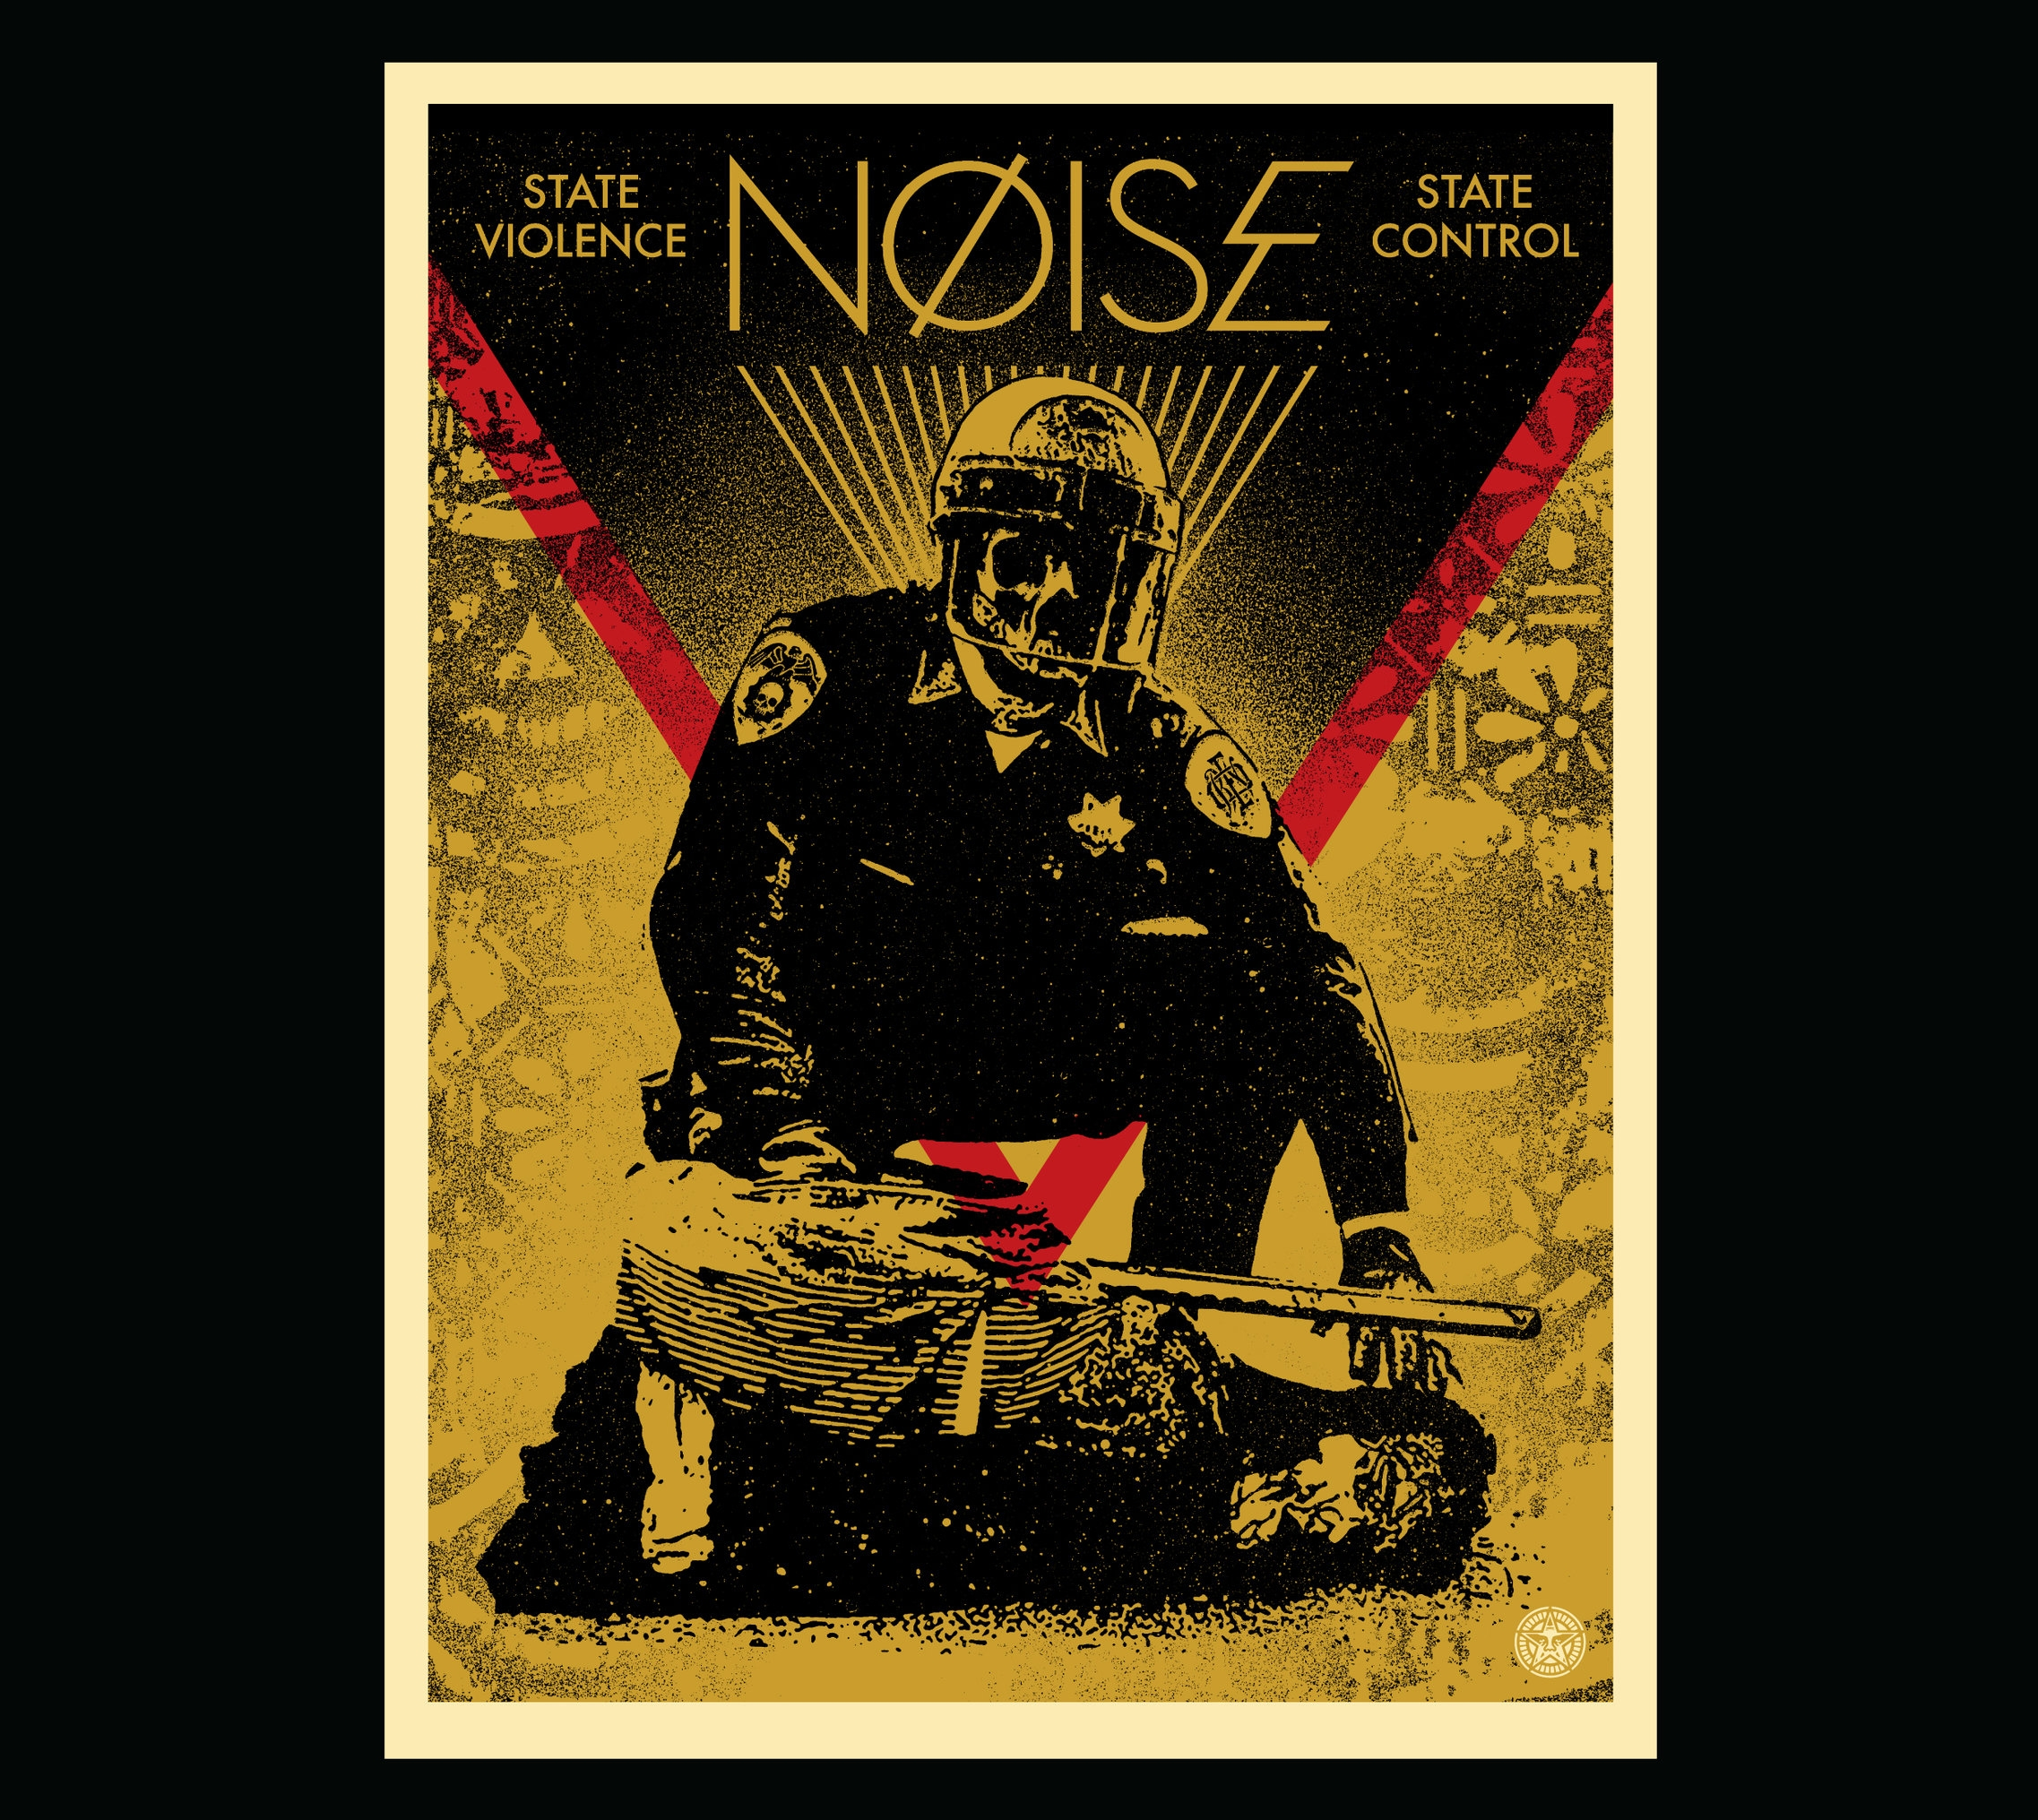 NOISE-State-Control-18X24-FNL.jpg